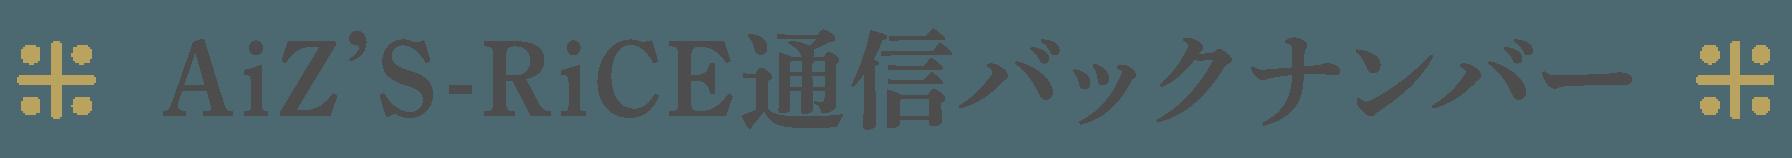 AiZ'S-RiCE通信バックナンバー